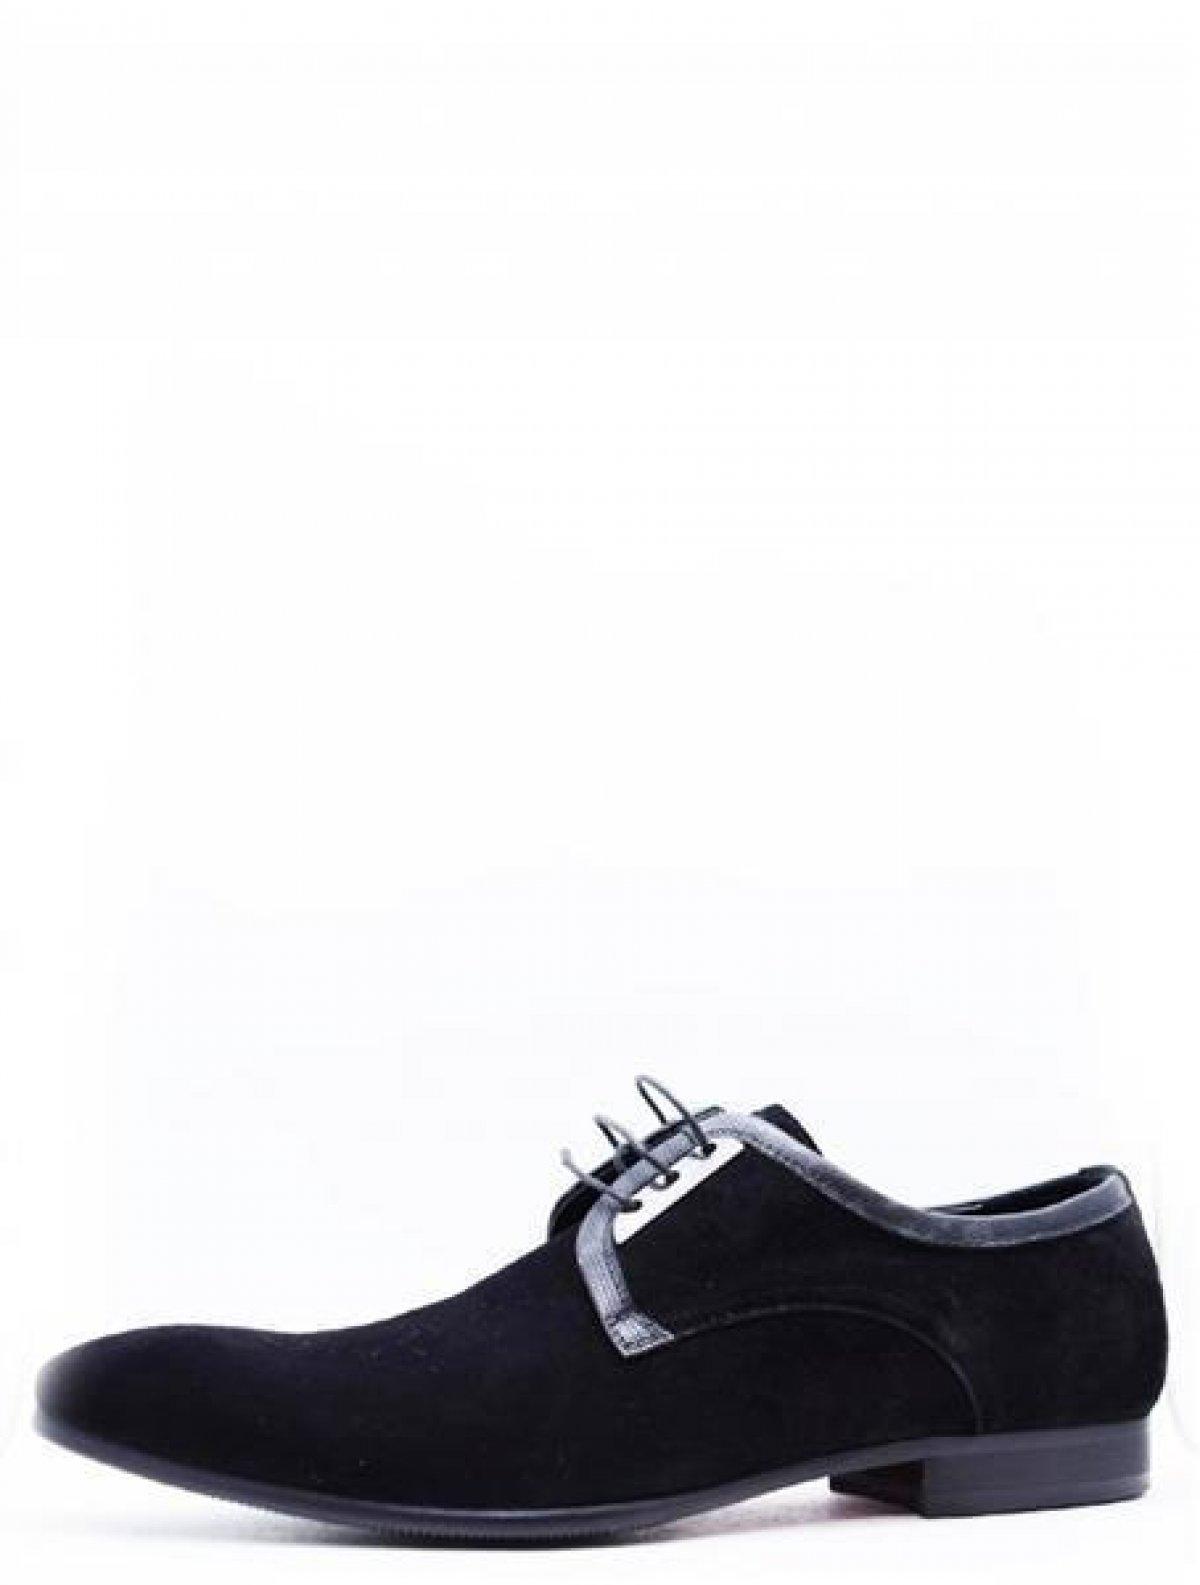 648231/02-02T мужские туфли